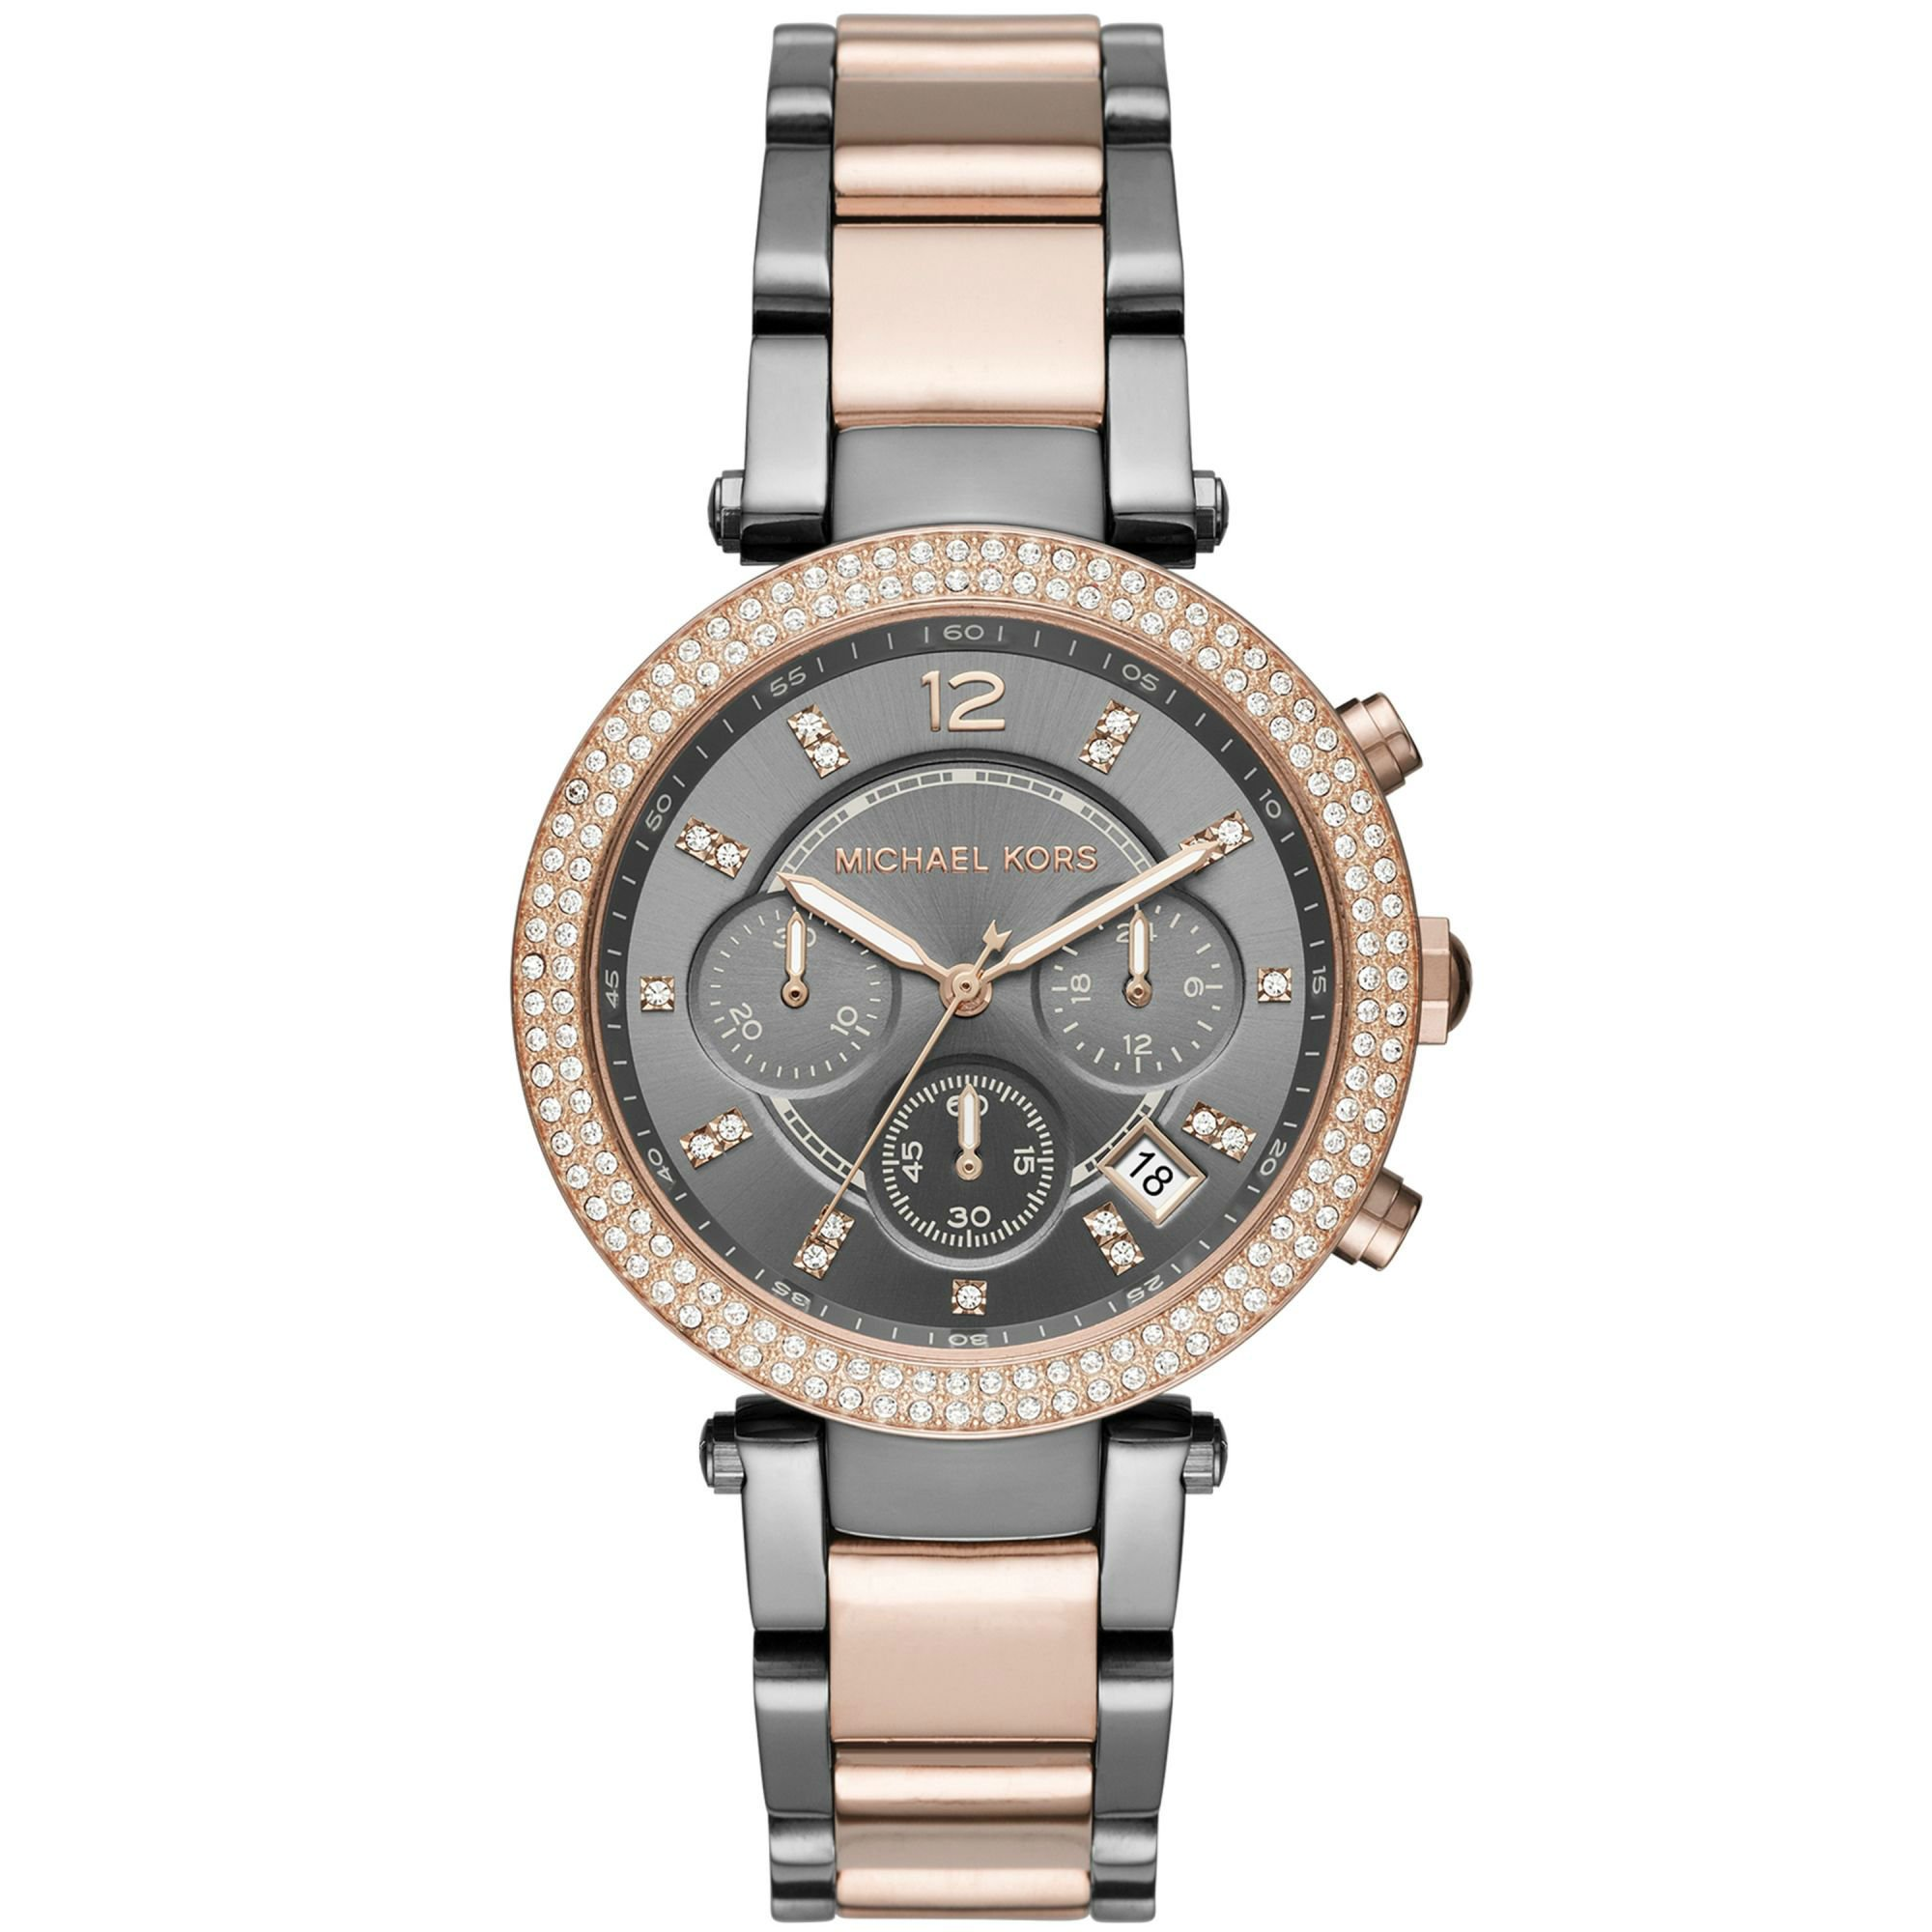 Michael Kors MK6440 Women's Parker Two-Tone Rose Gold Gunmetal Chronograph Watch by Michael Kors